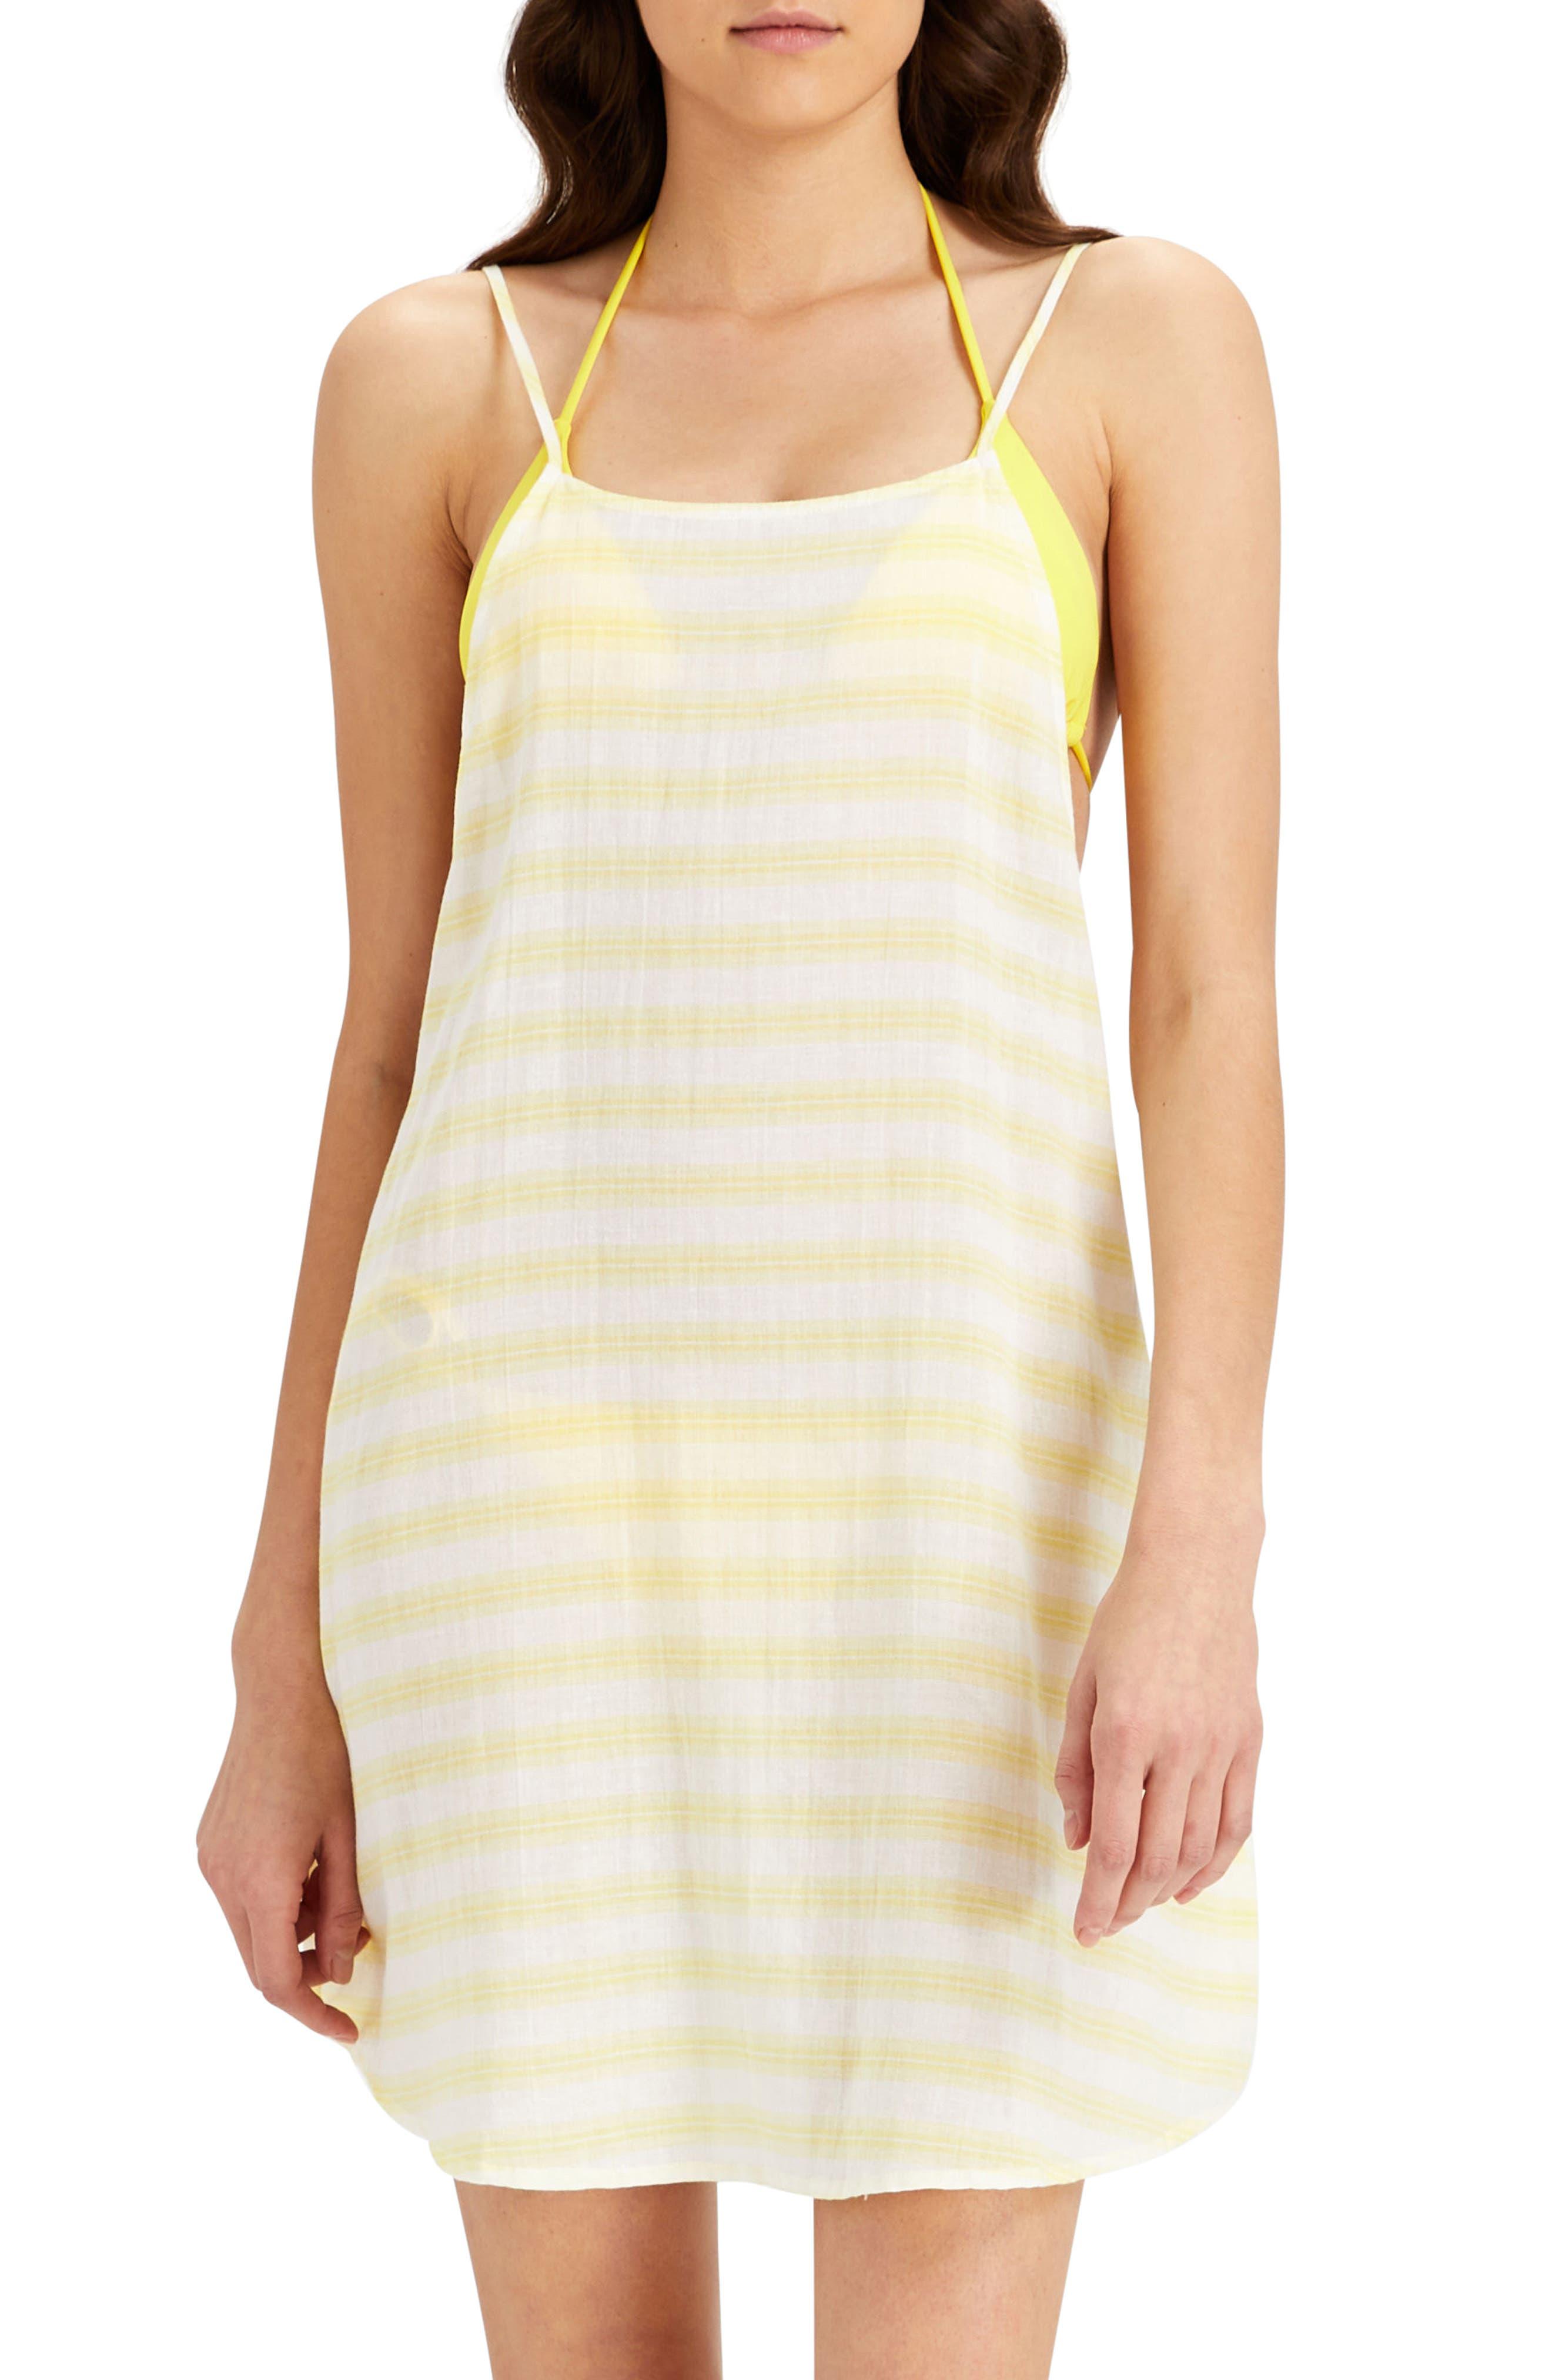 Sasha Cover-Up Shirtdress,                             Main thumbnail 1, color,                             Citrus/ White